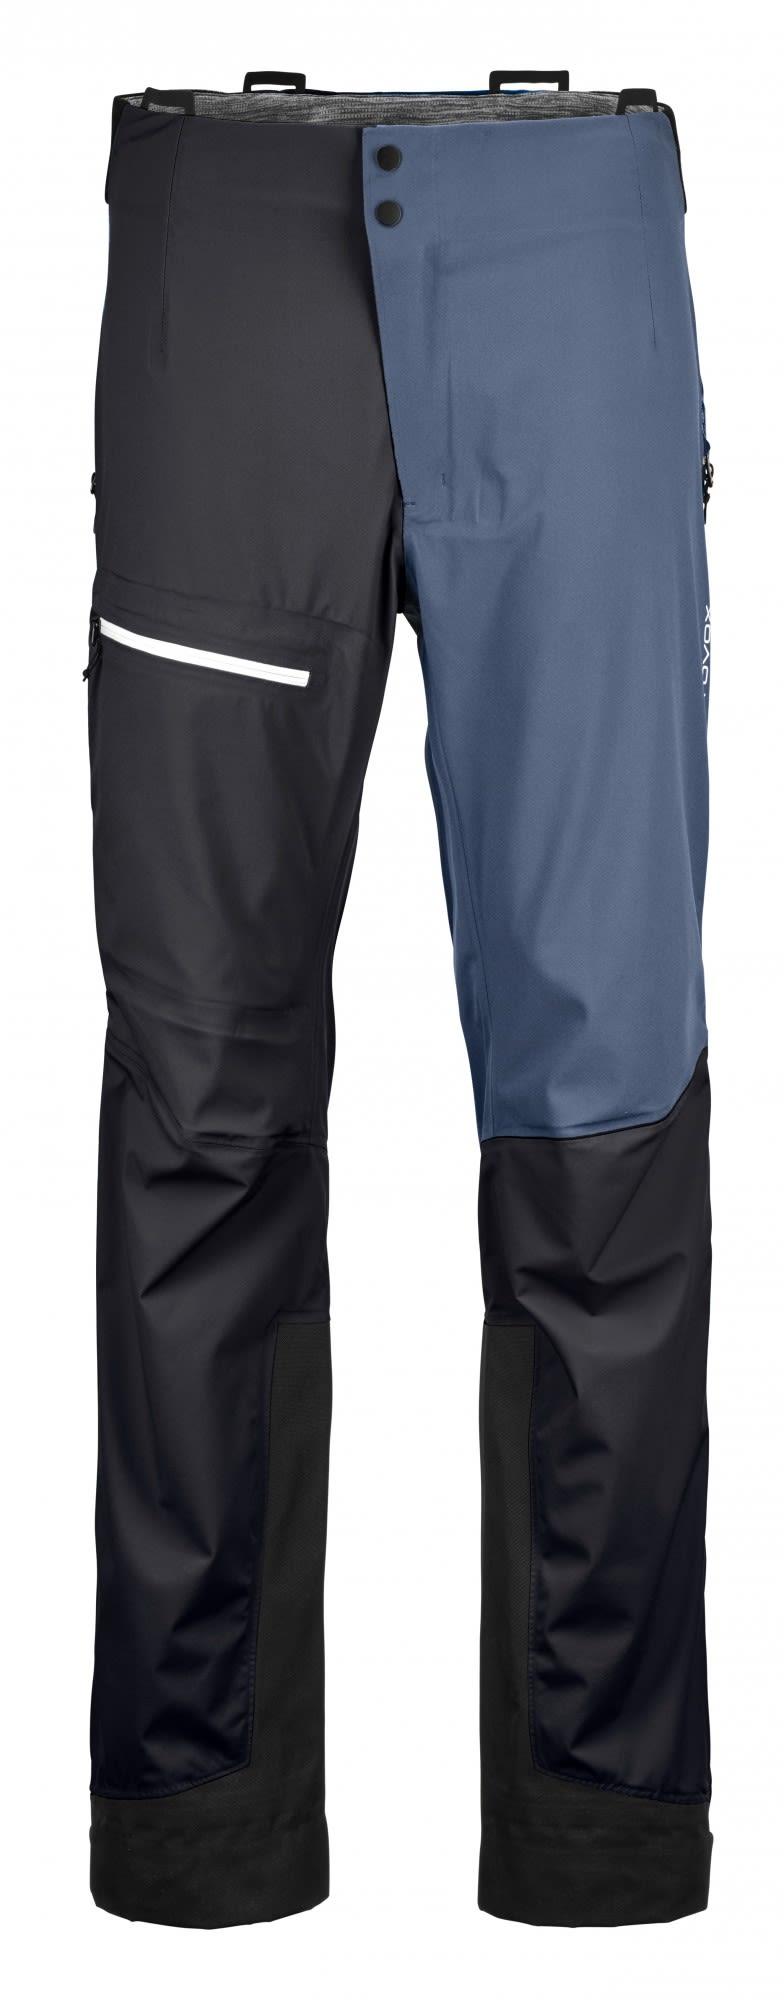 Ortovox Merino Naked Sheep 3L Ortler Pants Schwarz, Male Dermizax™ Hose, L